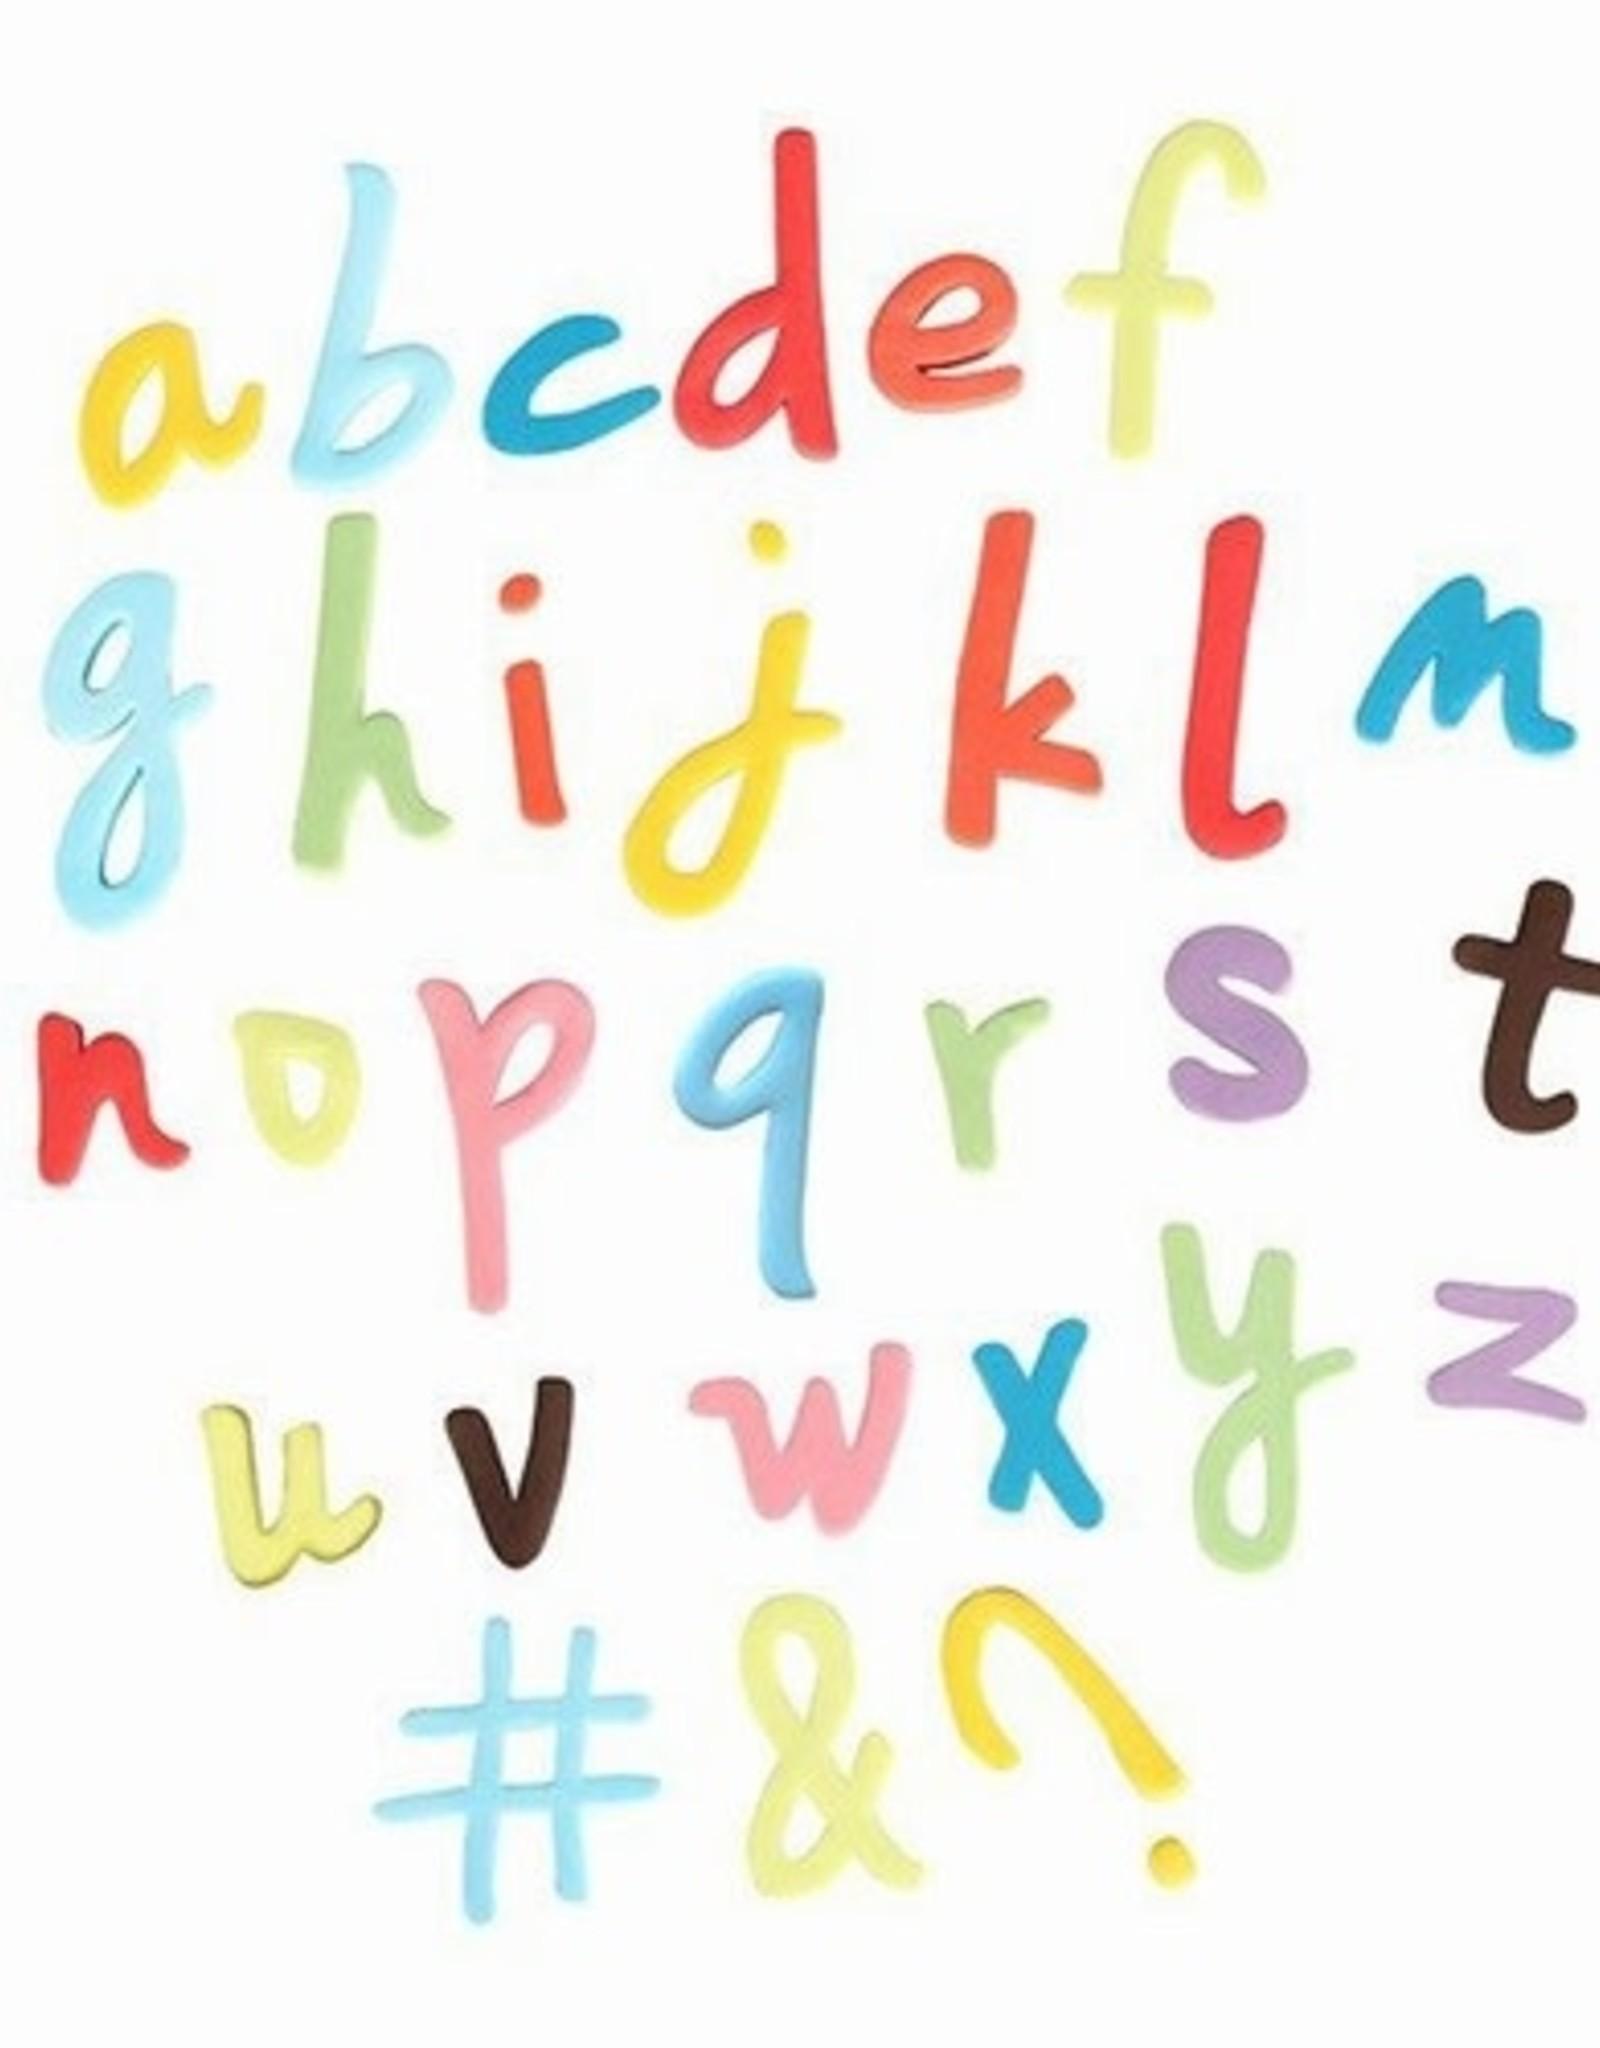 Cake Star Cake Star Push Easy Alphabet Cutters Lowercase Script Set/26